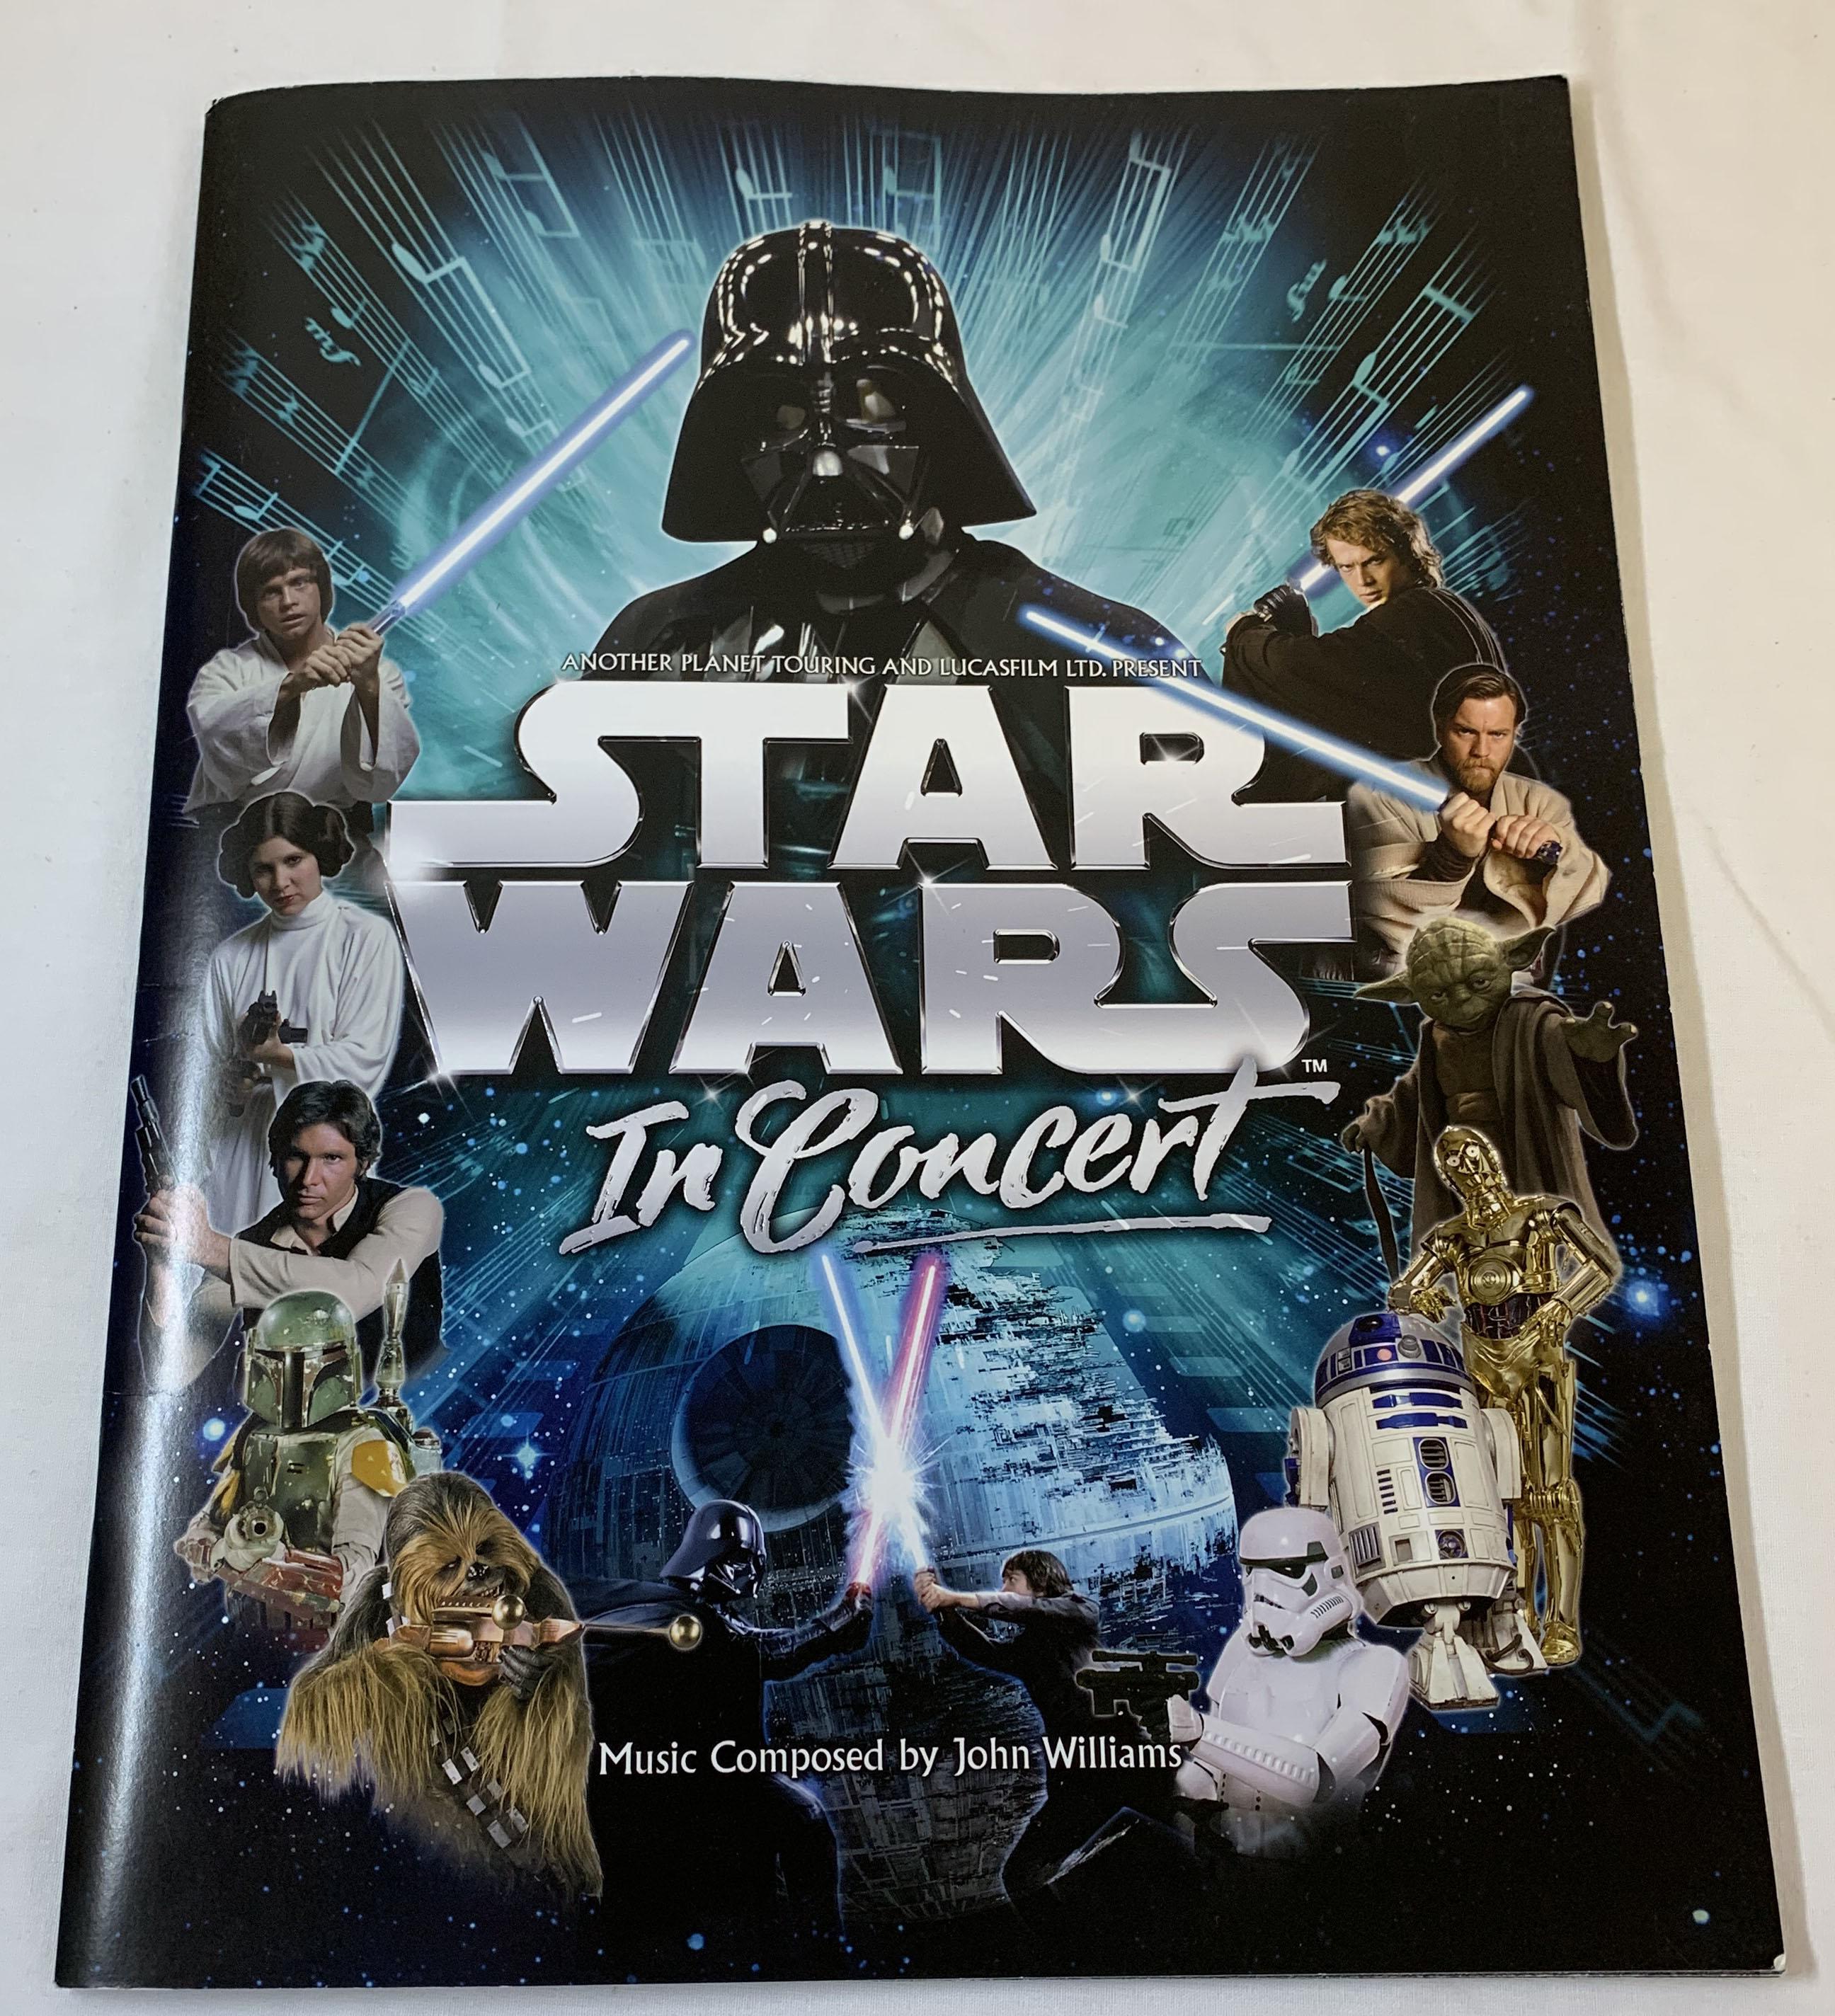 Star Wars In Concert (Souvenir Program)